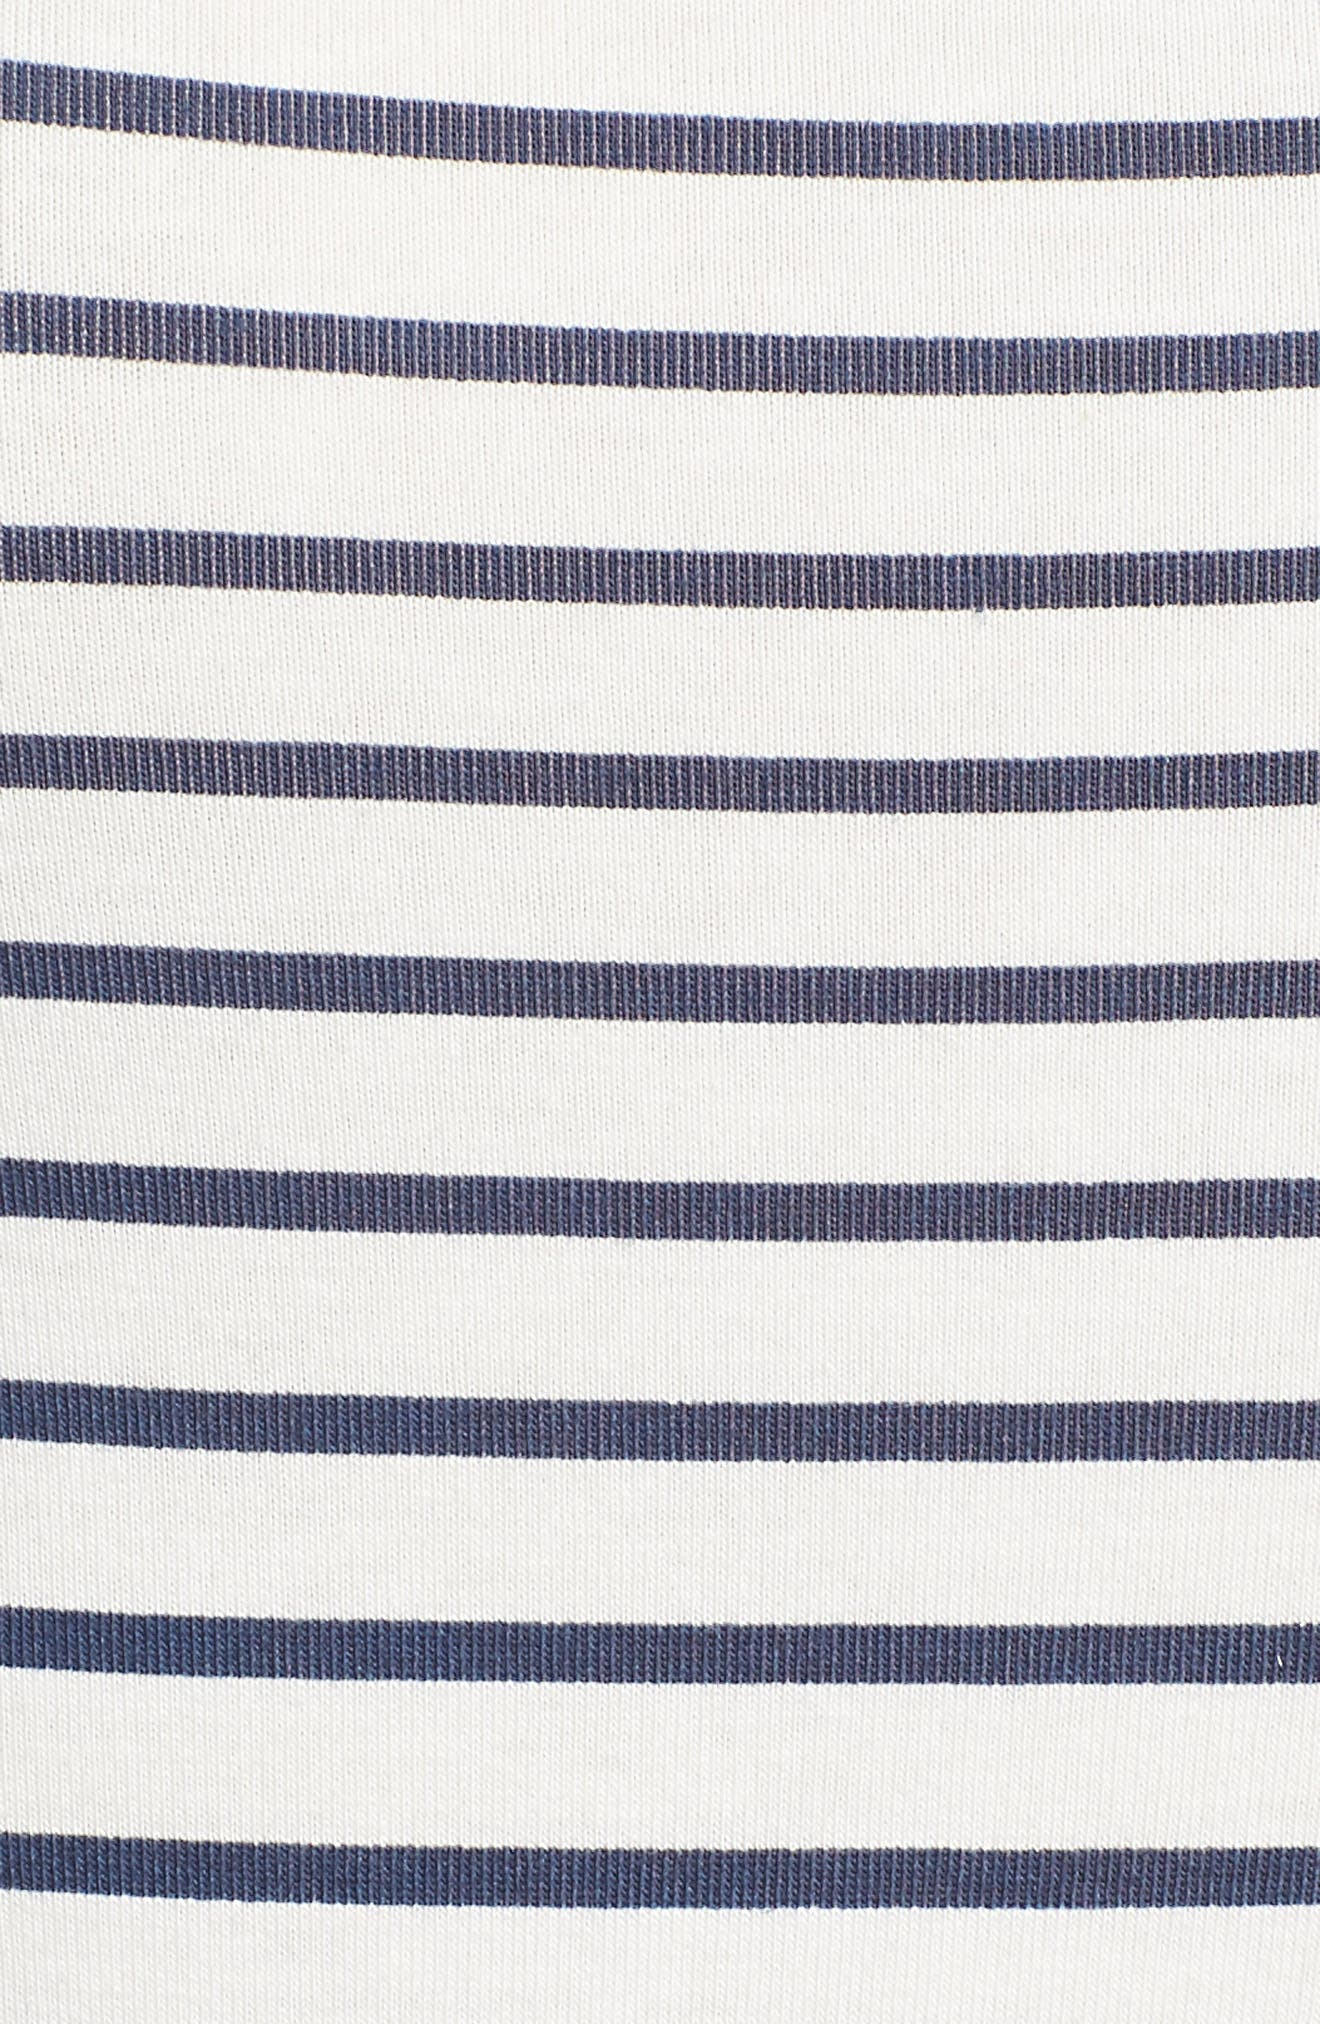 Stripe Square Neck Bodysuit,                             Alternate thumbnail 5, color,                             WHITE / NAVY STRIPE